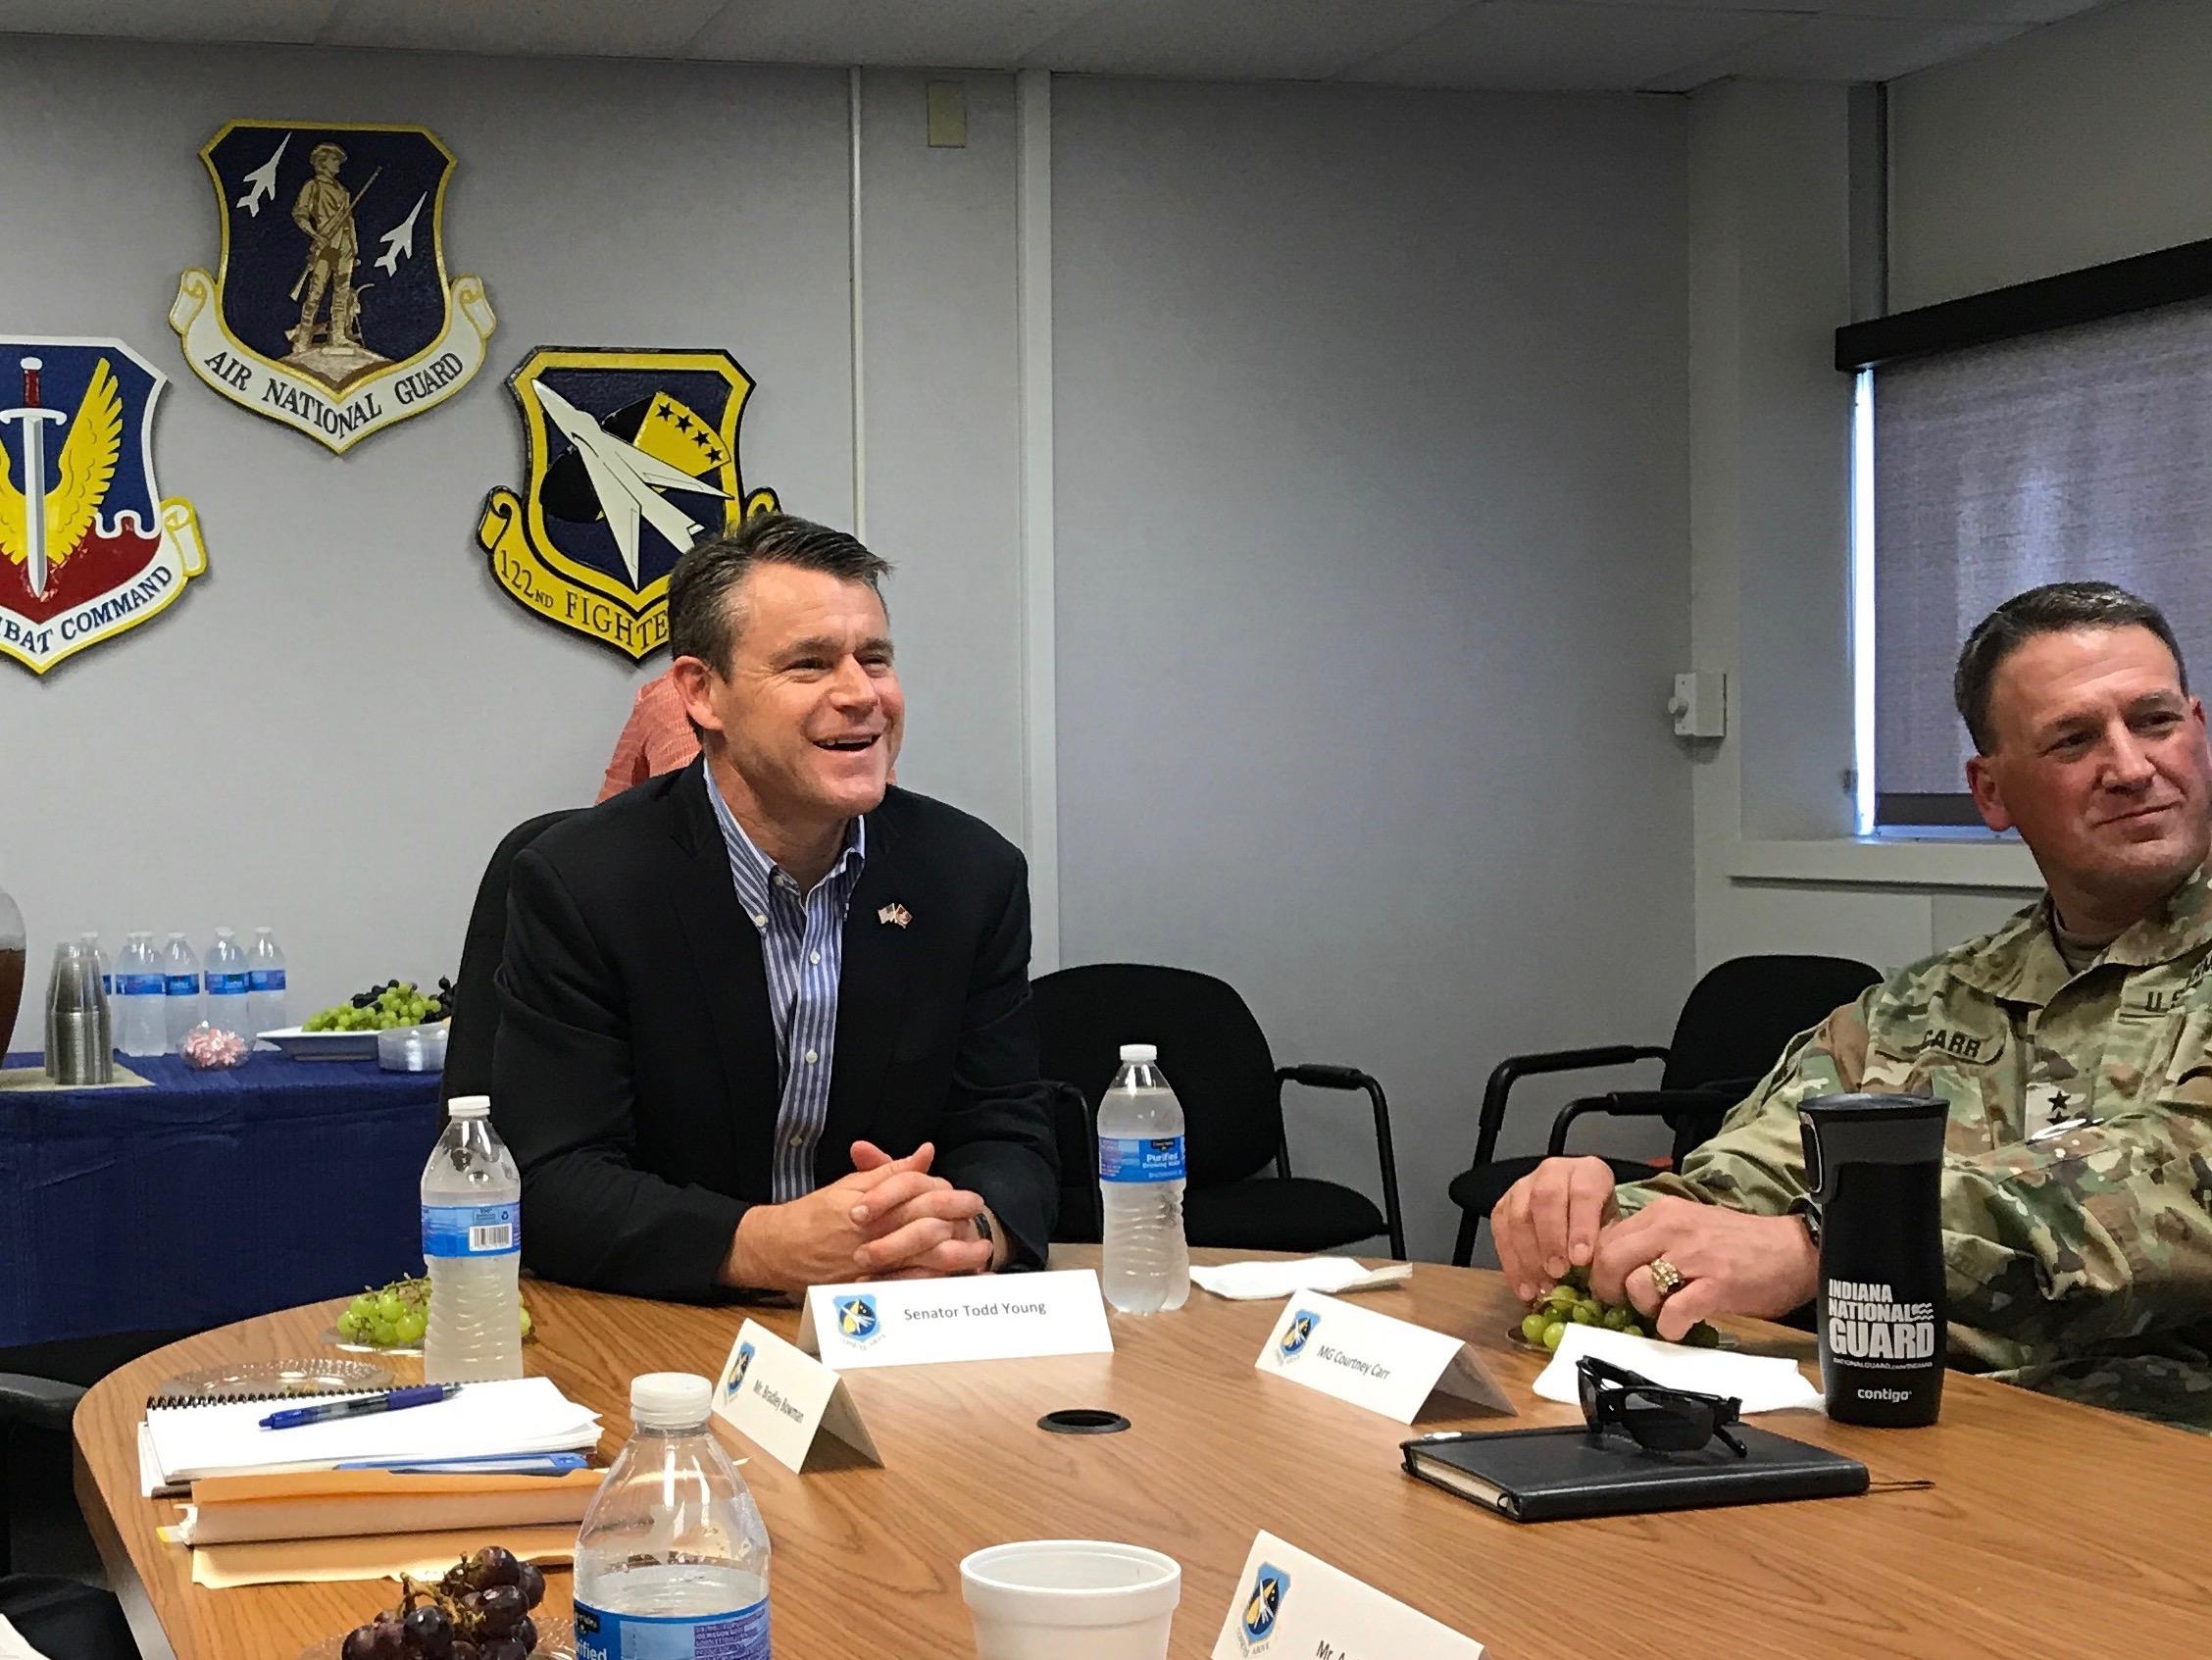 Young Visits Key Indiana Military Bases6